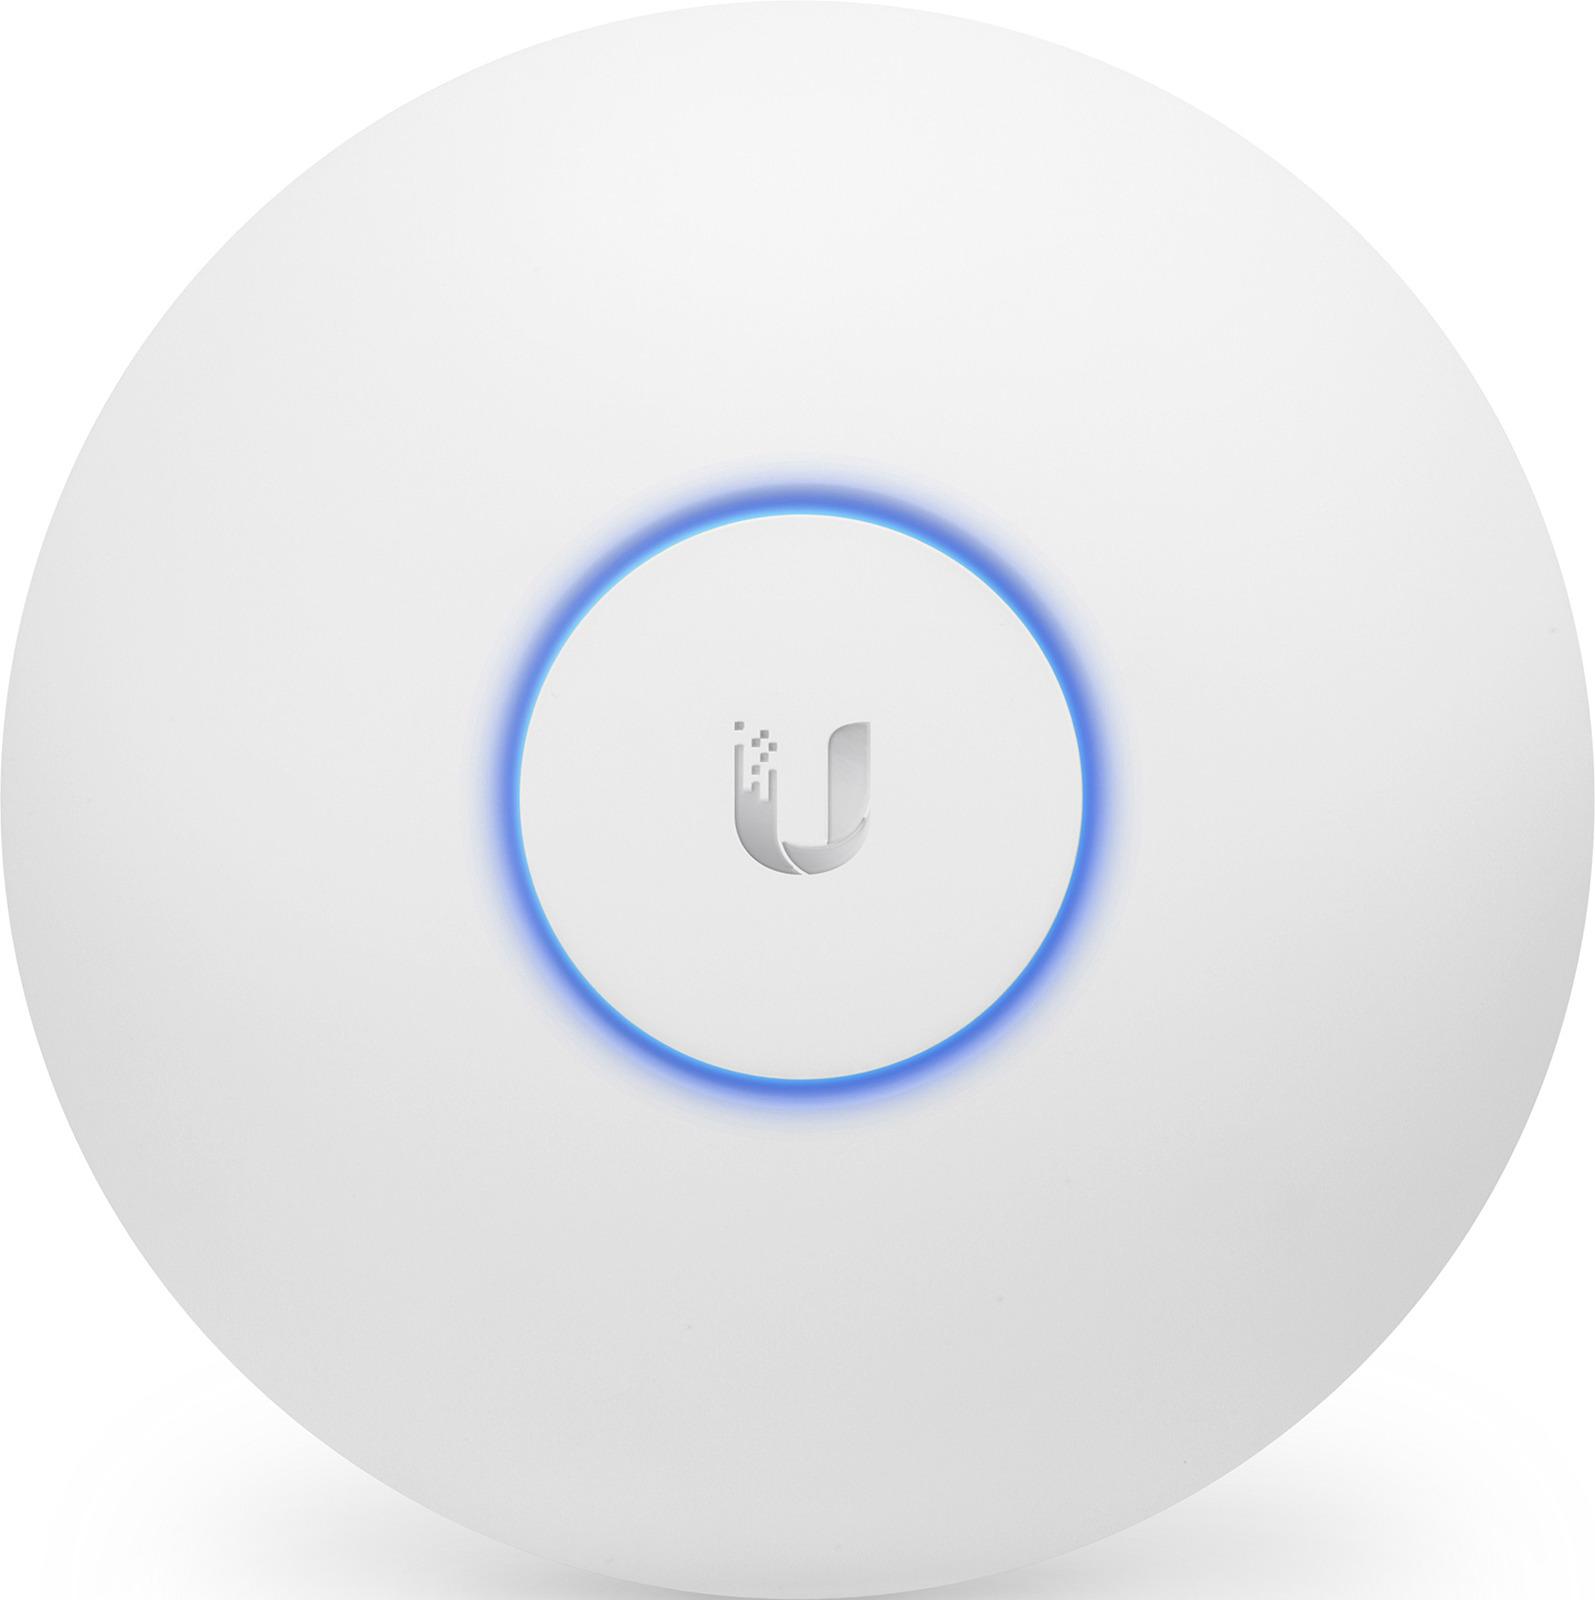 Точка доступа Ubiquiti, UAP-LR(EU), белый